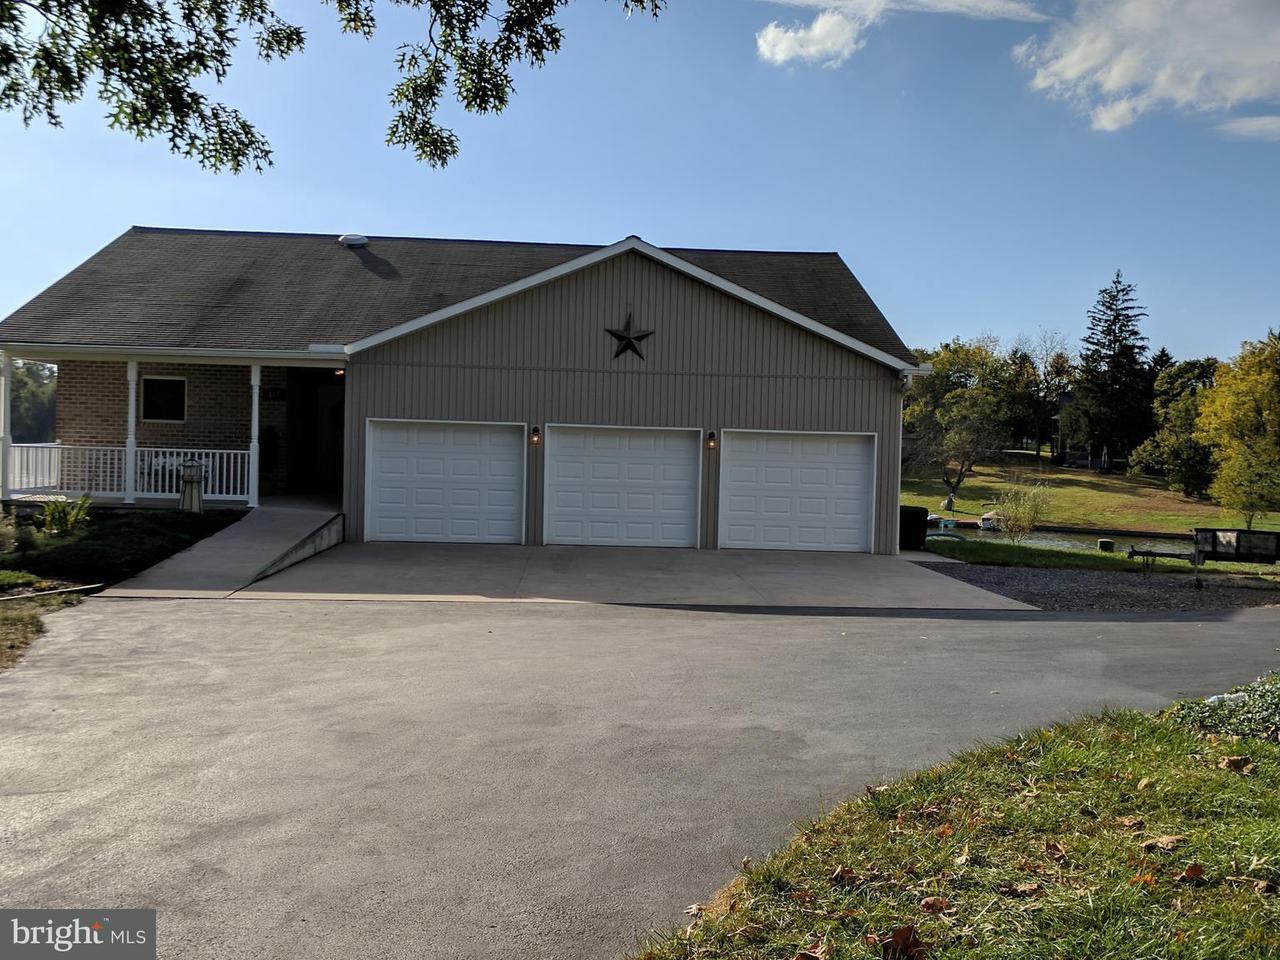 独户住宅 为 销售 在 487 HERITAGE Drive 487 HERITAGE Drive Gettysburg, 宾夕法尼亚州 17325 美国